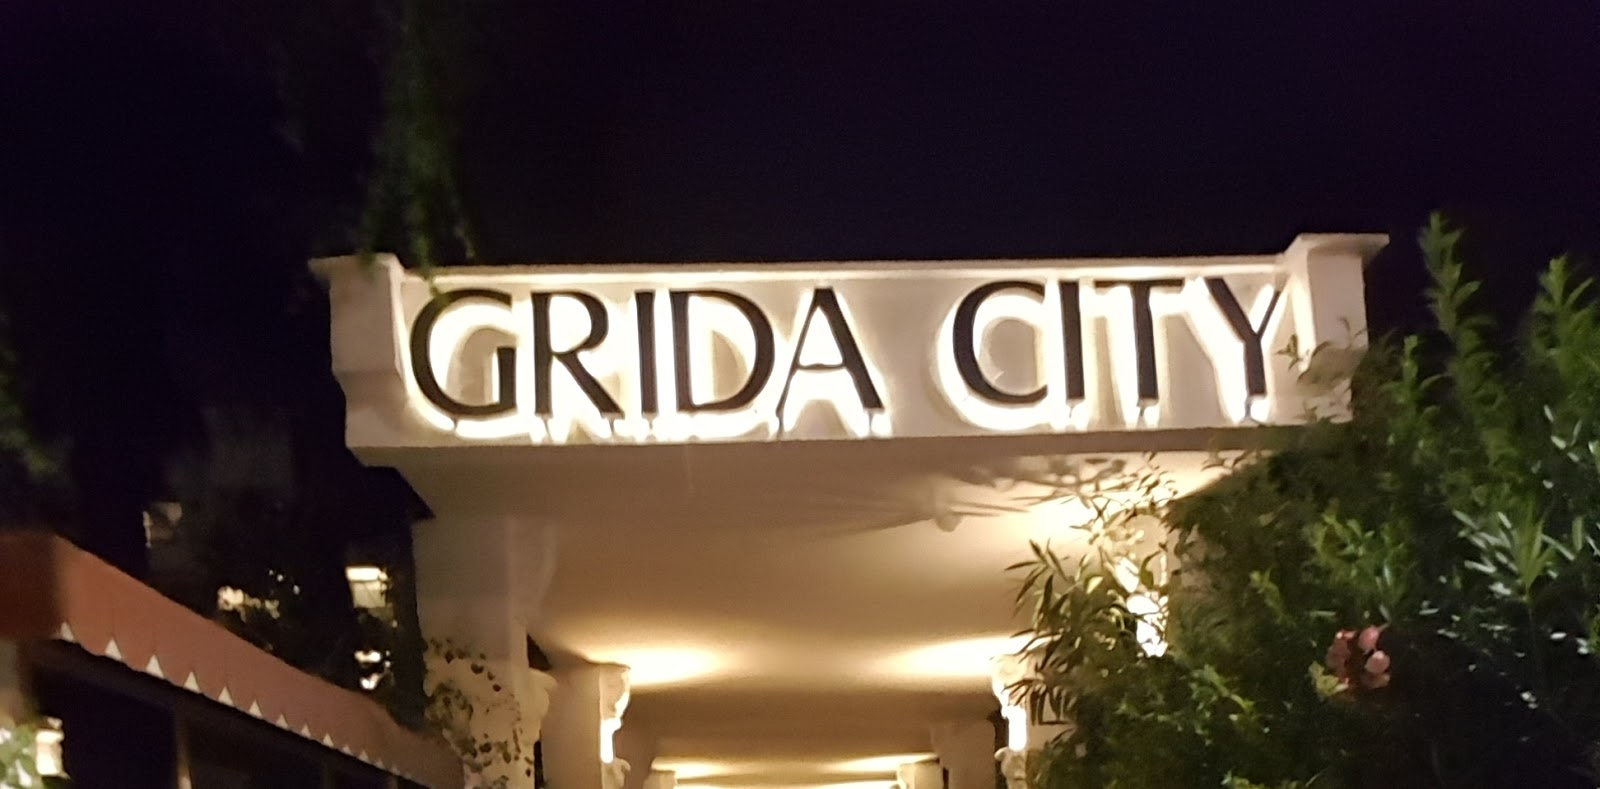 Our Stay At Grida City Hotel In Antalya Turkey Turkey Namaa